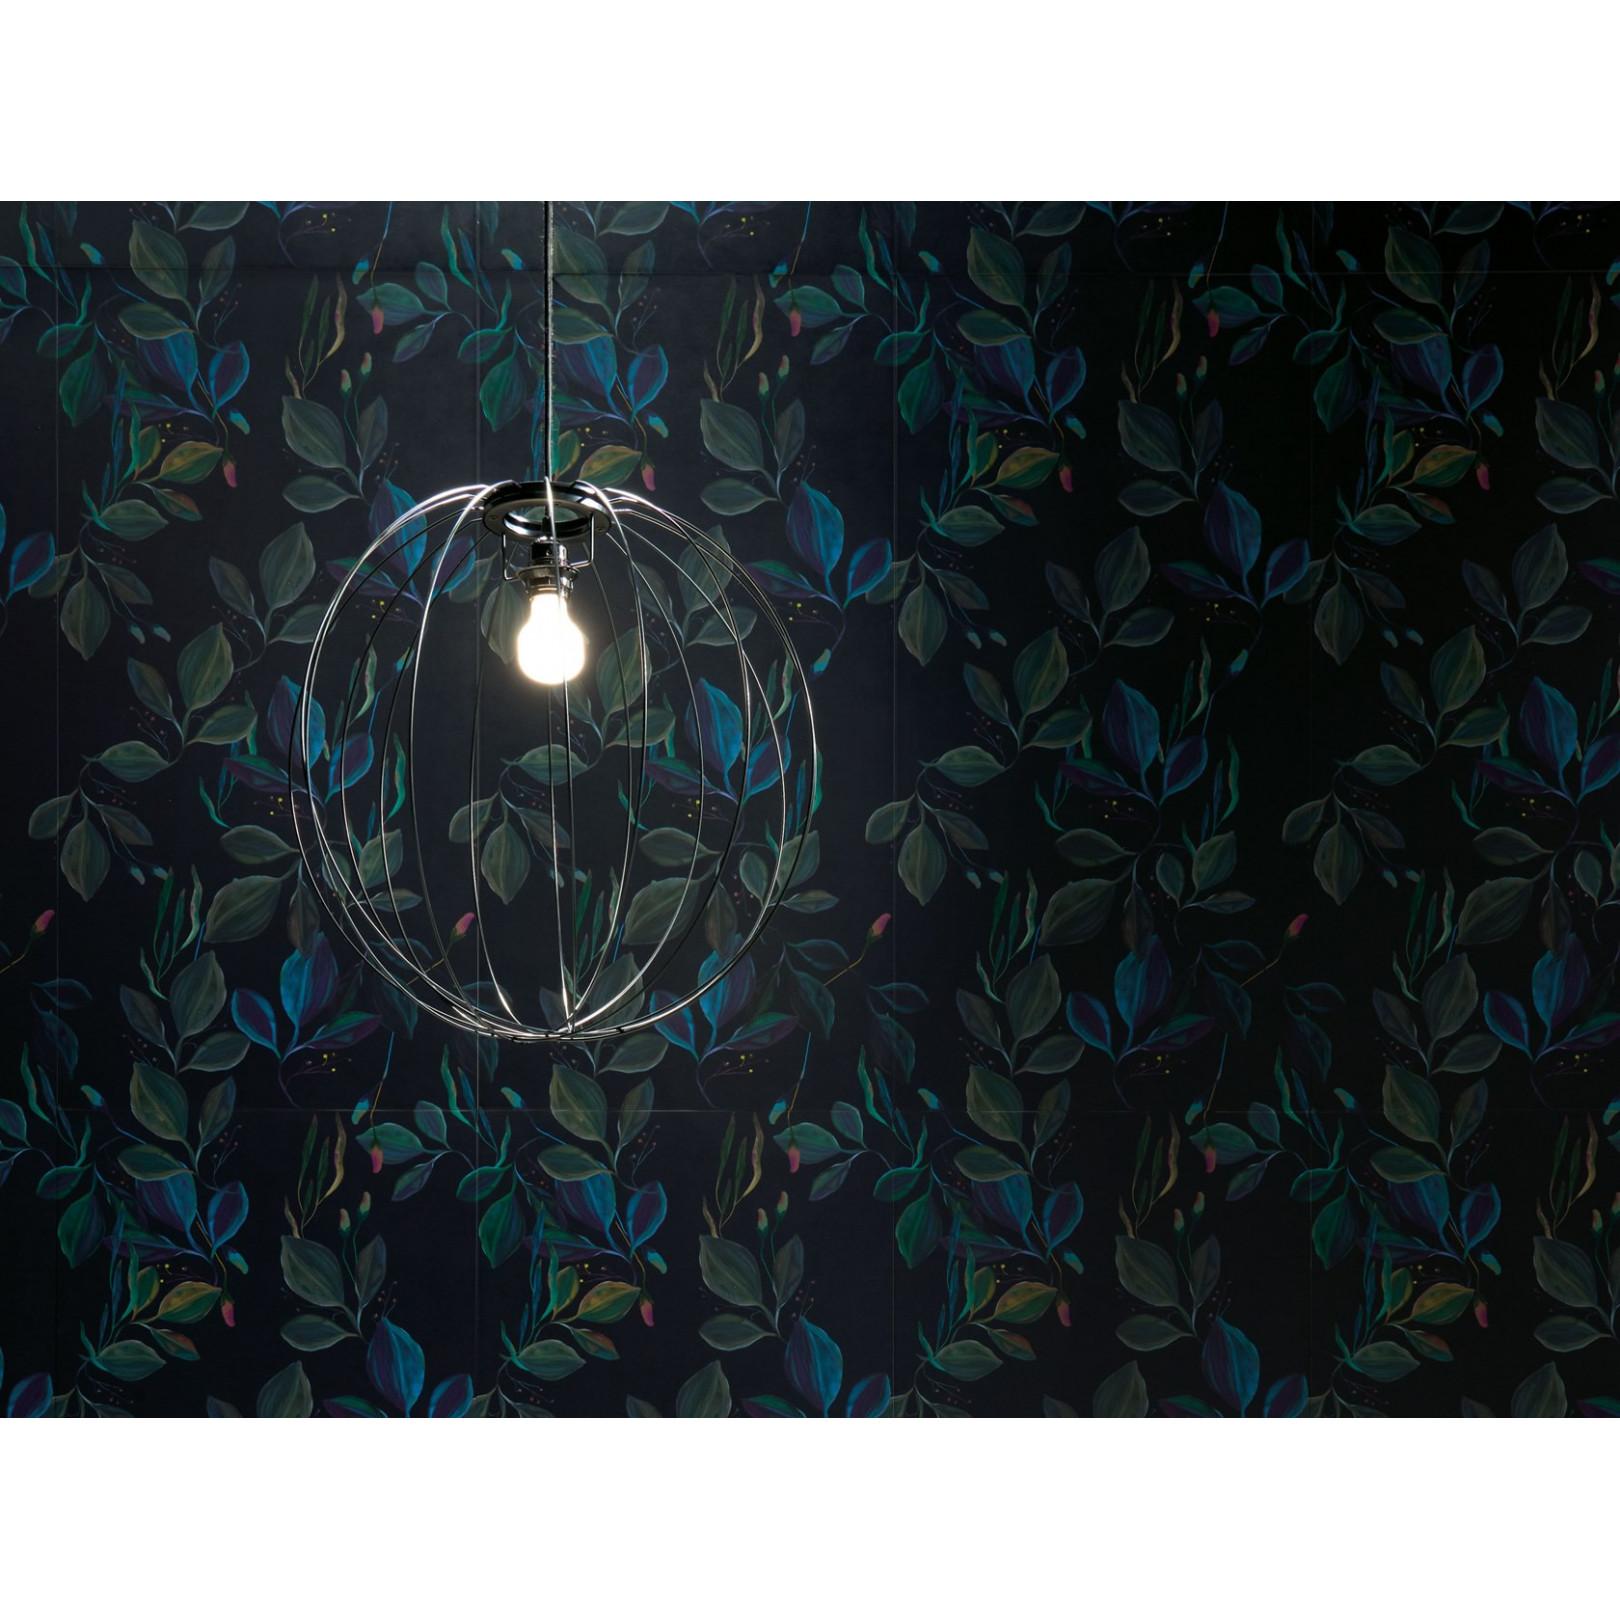 Carrelage grès cérame effet papier peint Scenari Dark Moon